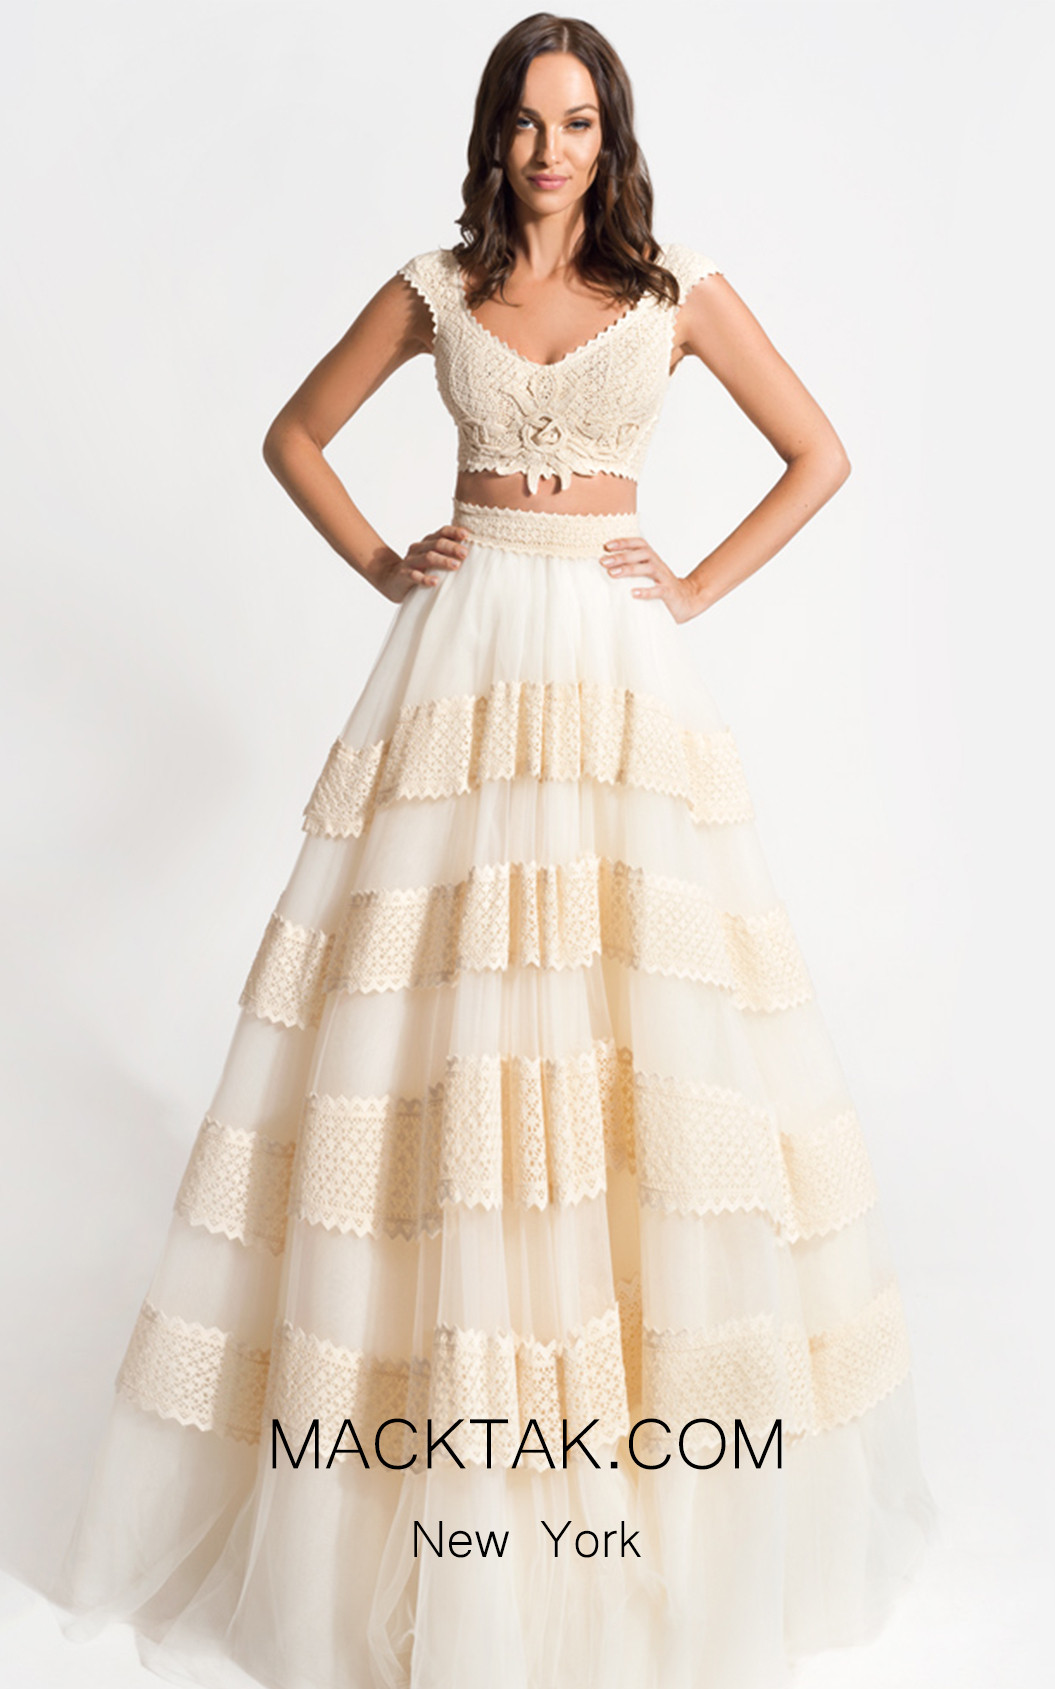 Zolotas Atelier Alcyone Front Evening Dress